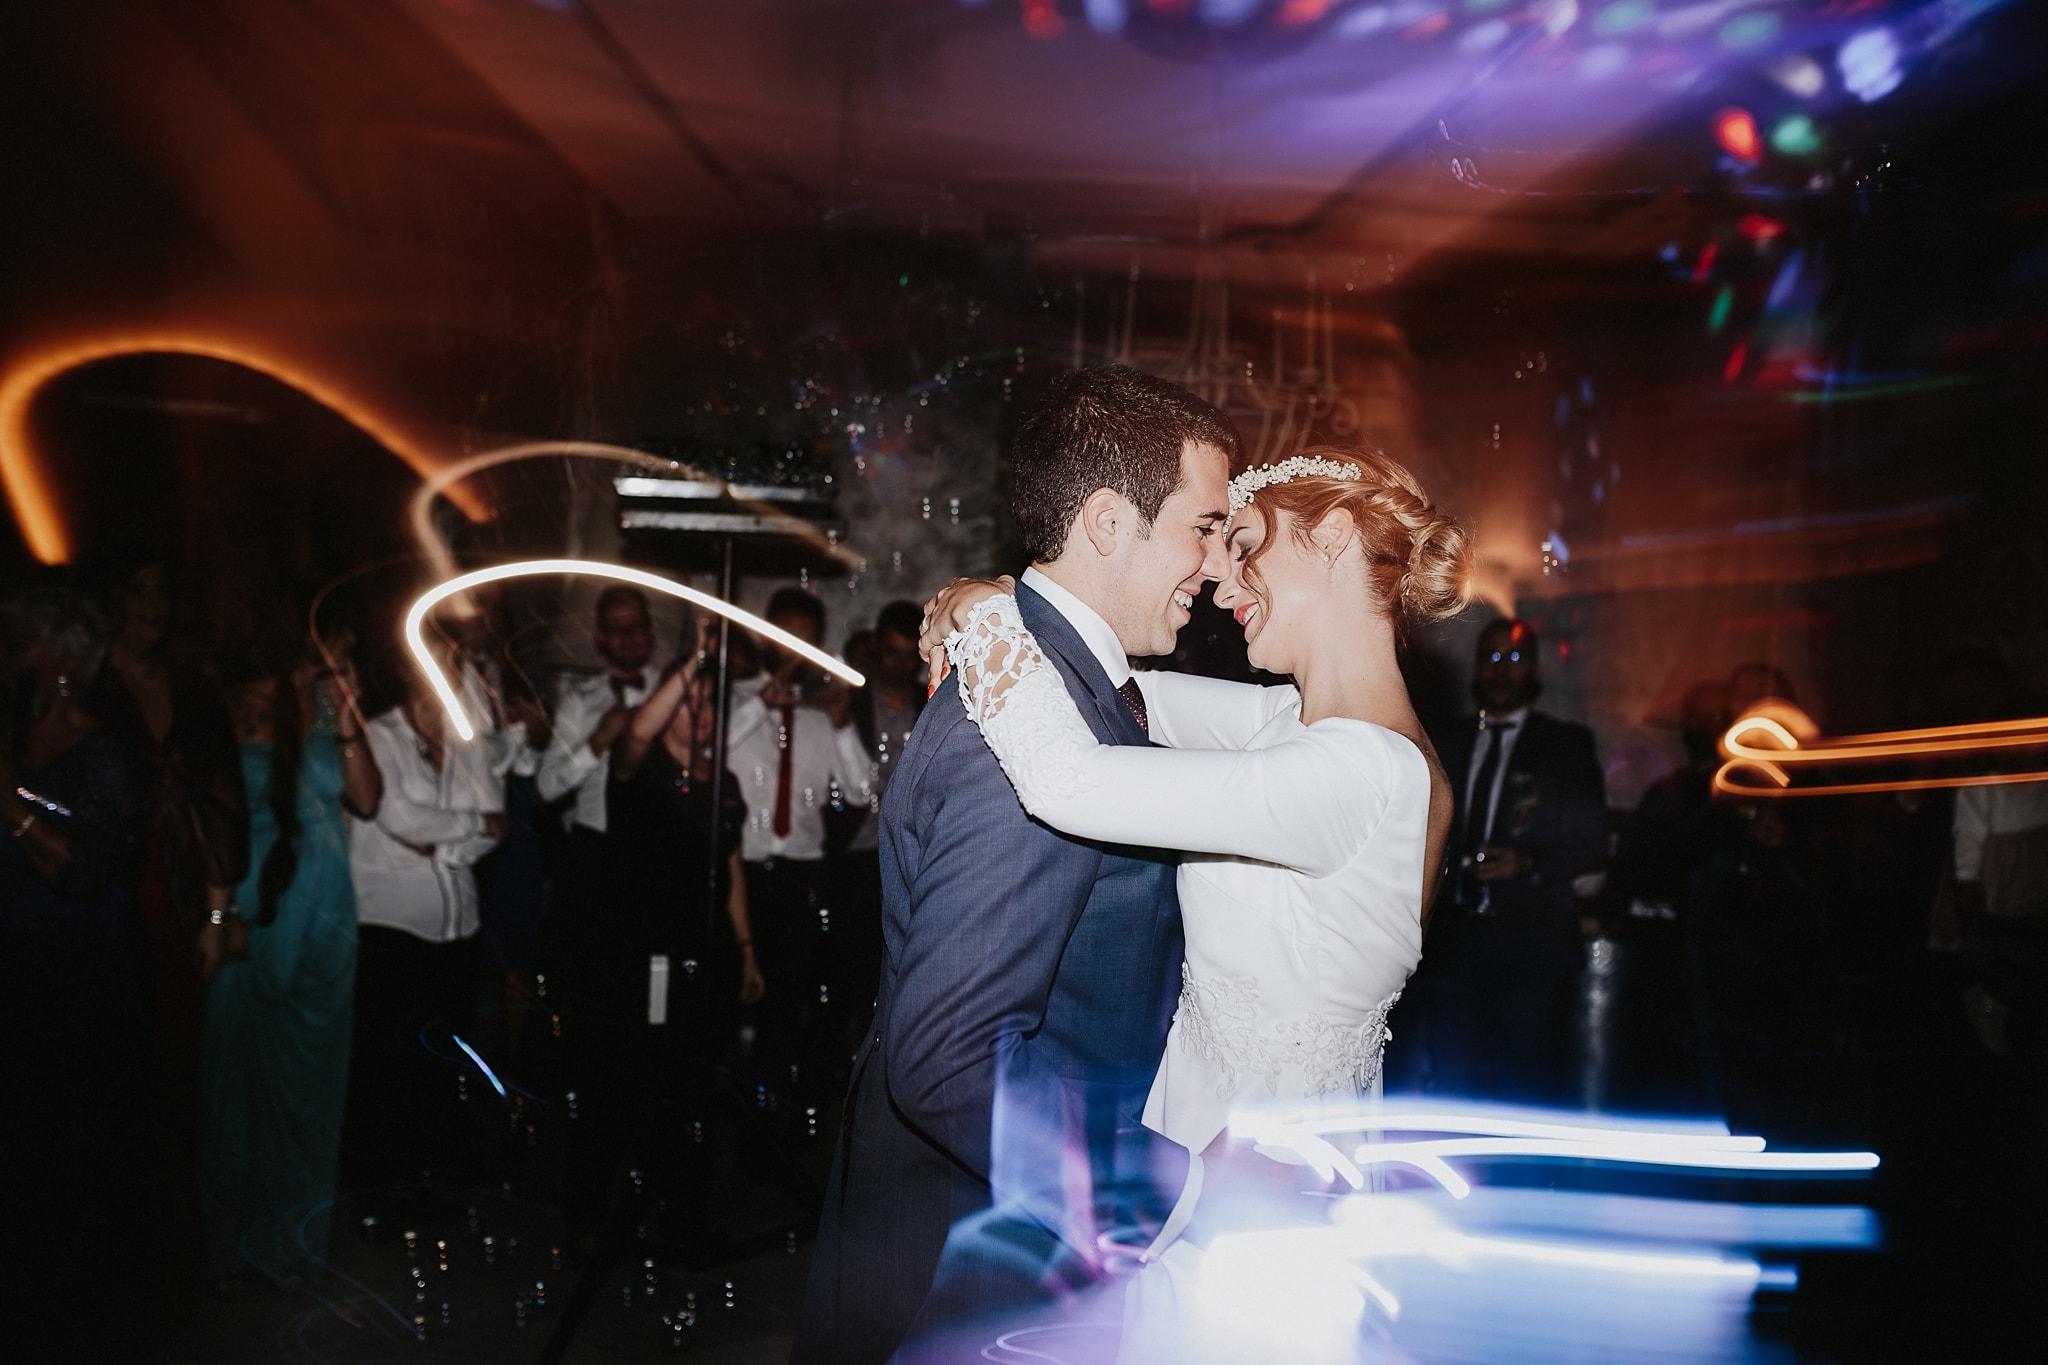 prisma-blanco-fotografos-bodas-toledo-171